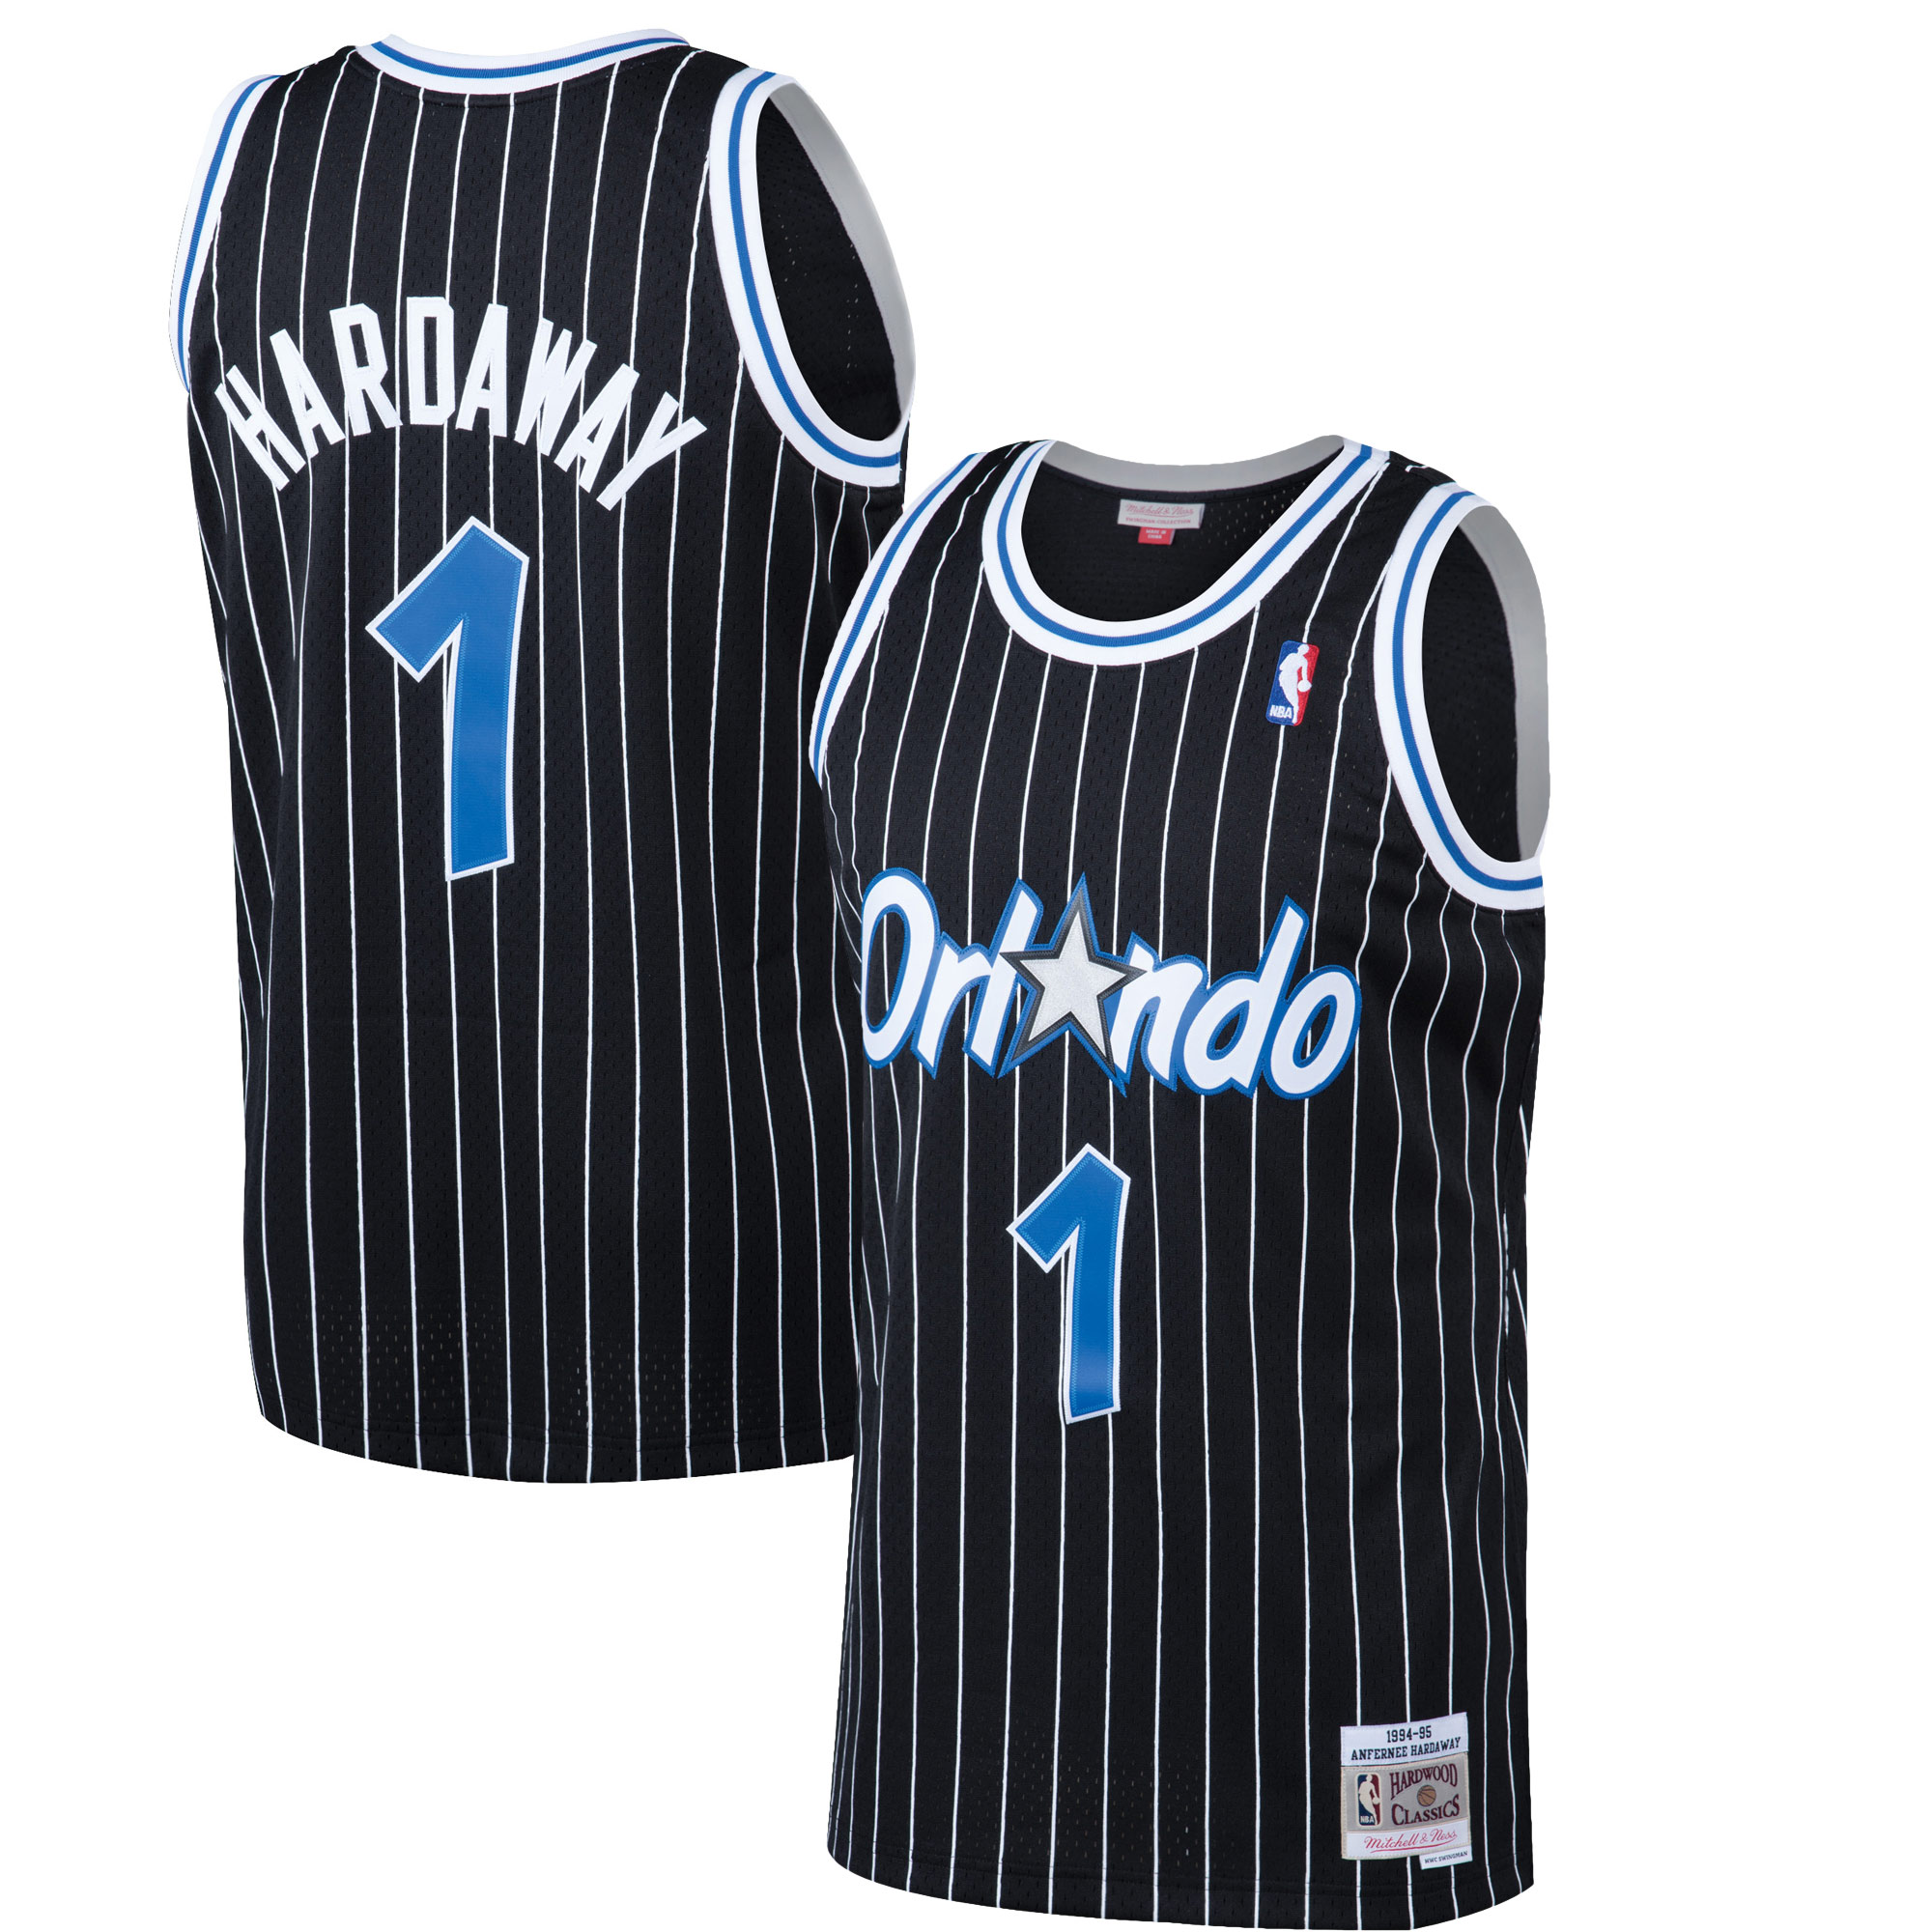 Anfernee Hardaway Orlando Magic NBA Mitchell & Ness Black 1994-95 Swingman Throwback Jersey For Men